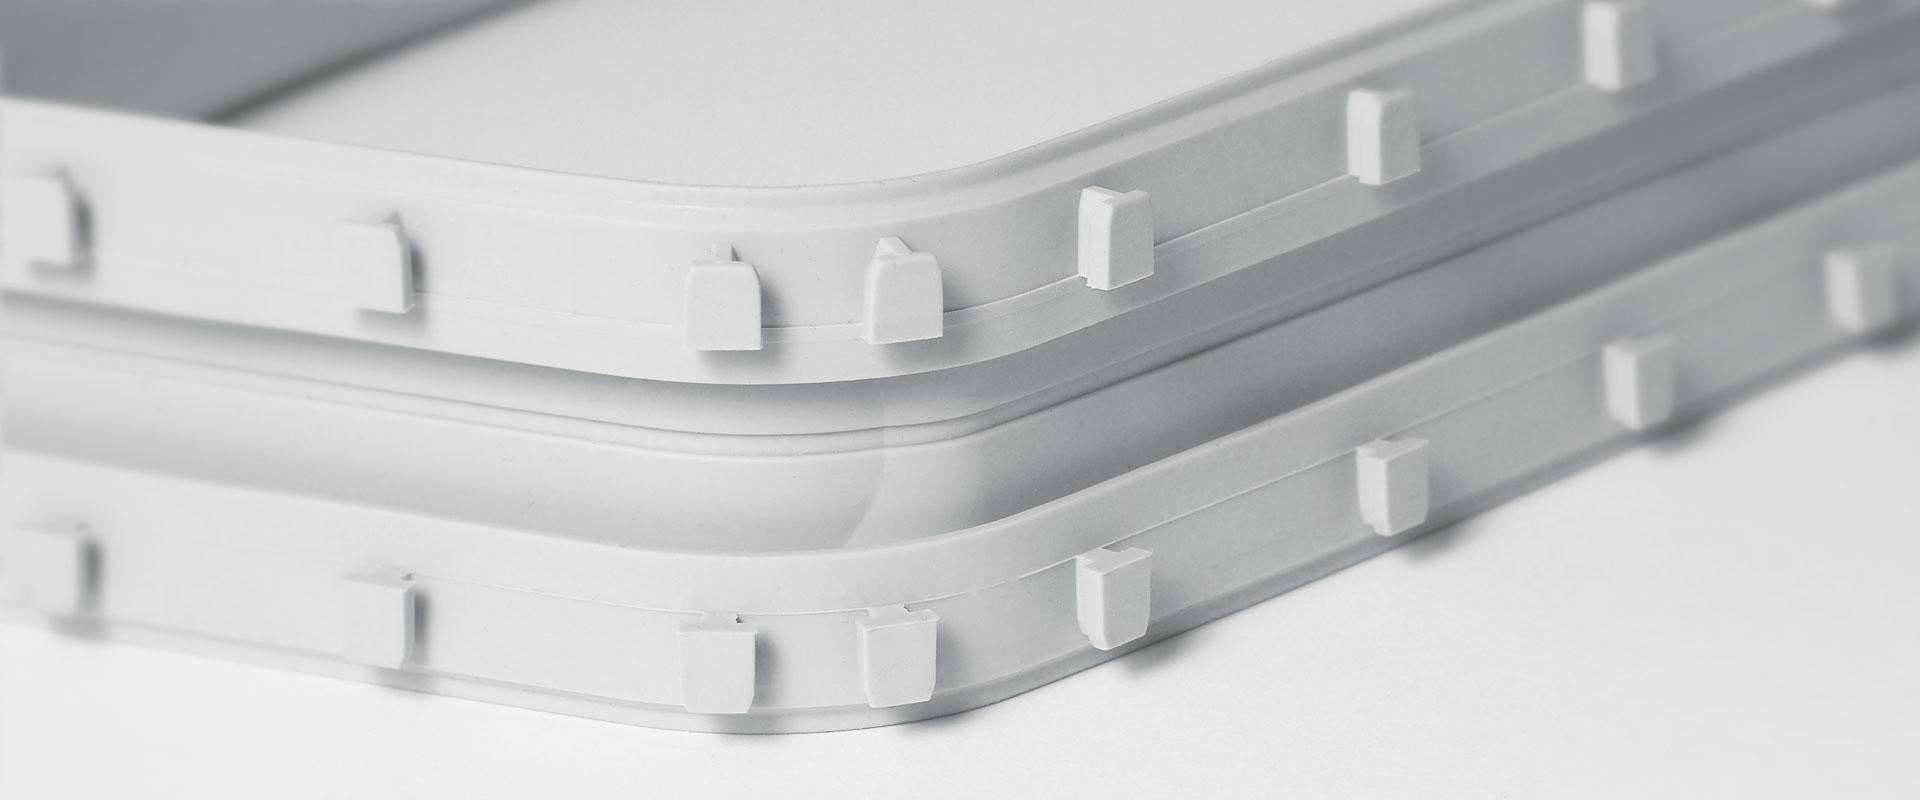 Formteile 1 - ELGRO Technology GmbH